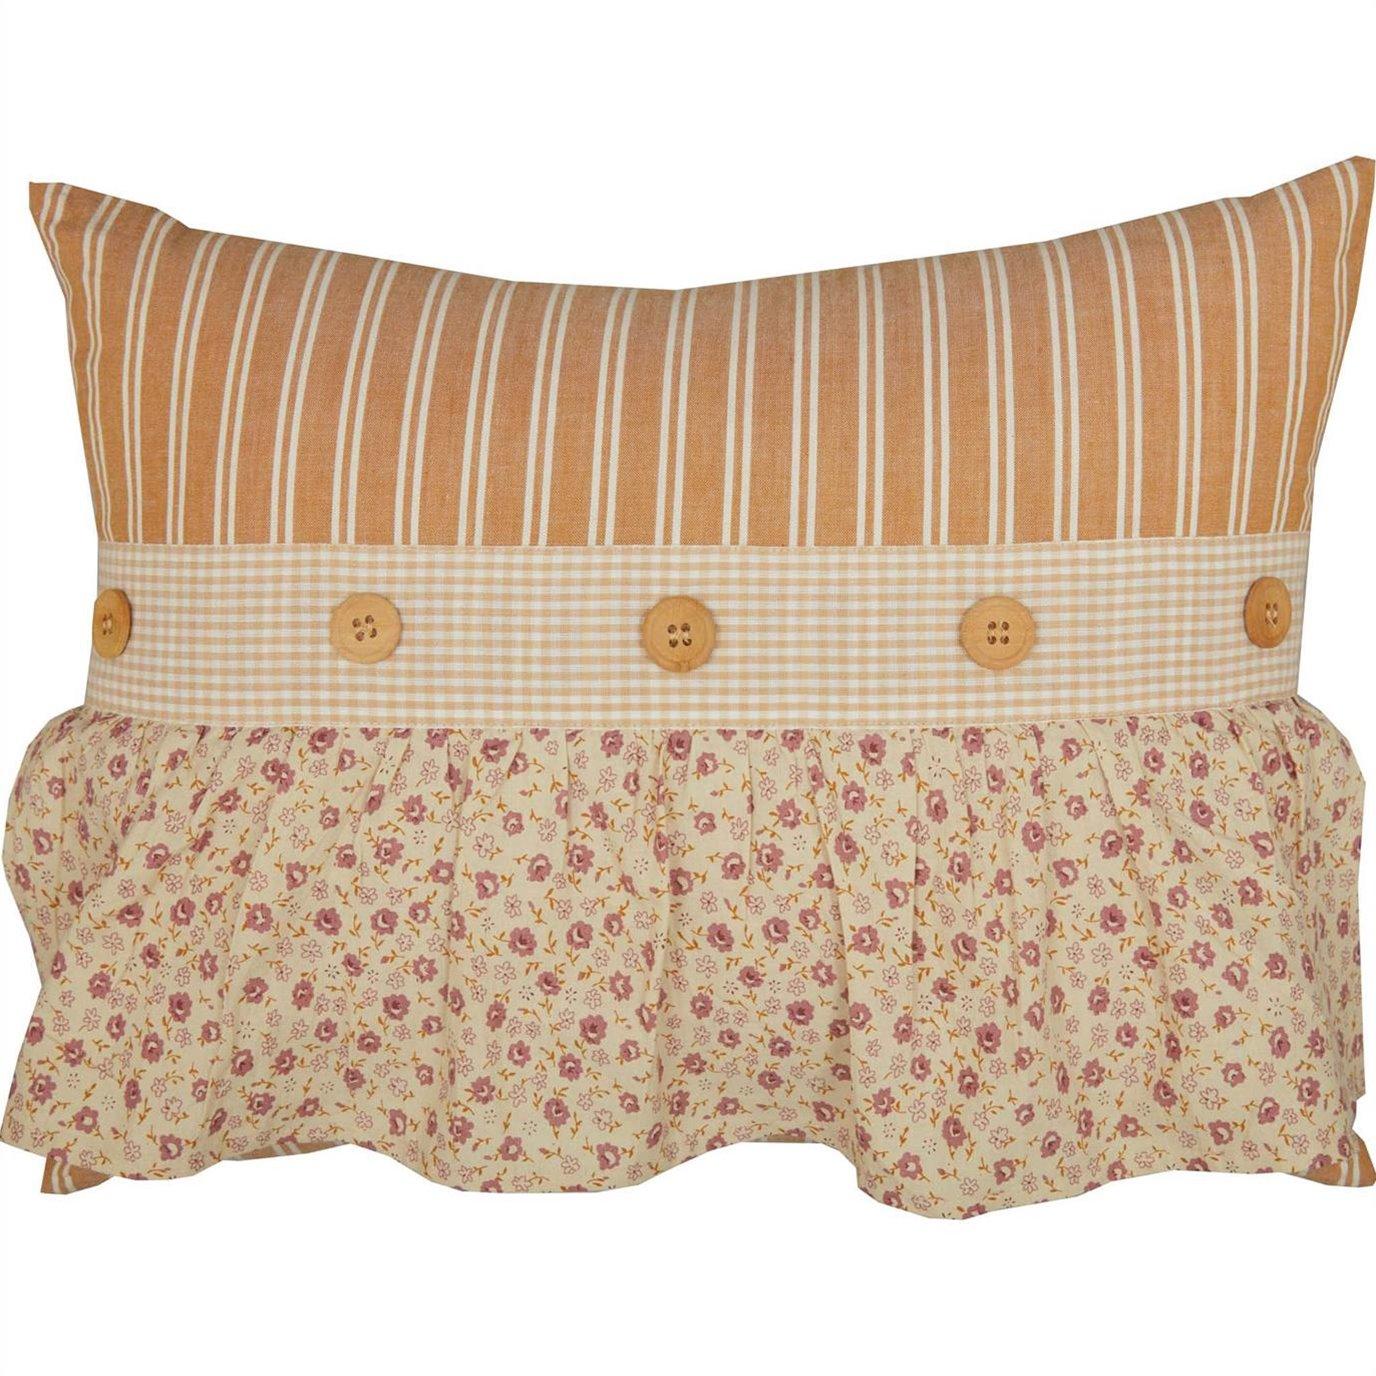 Camilia Ruffled Pillow 14x18